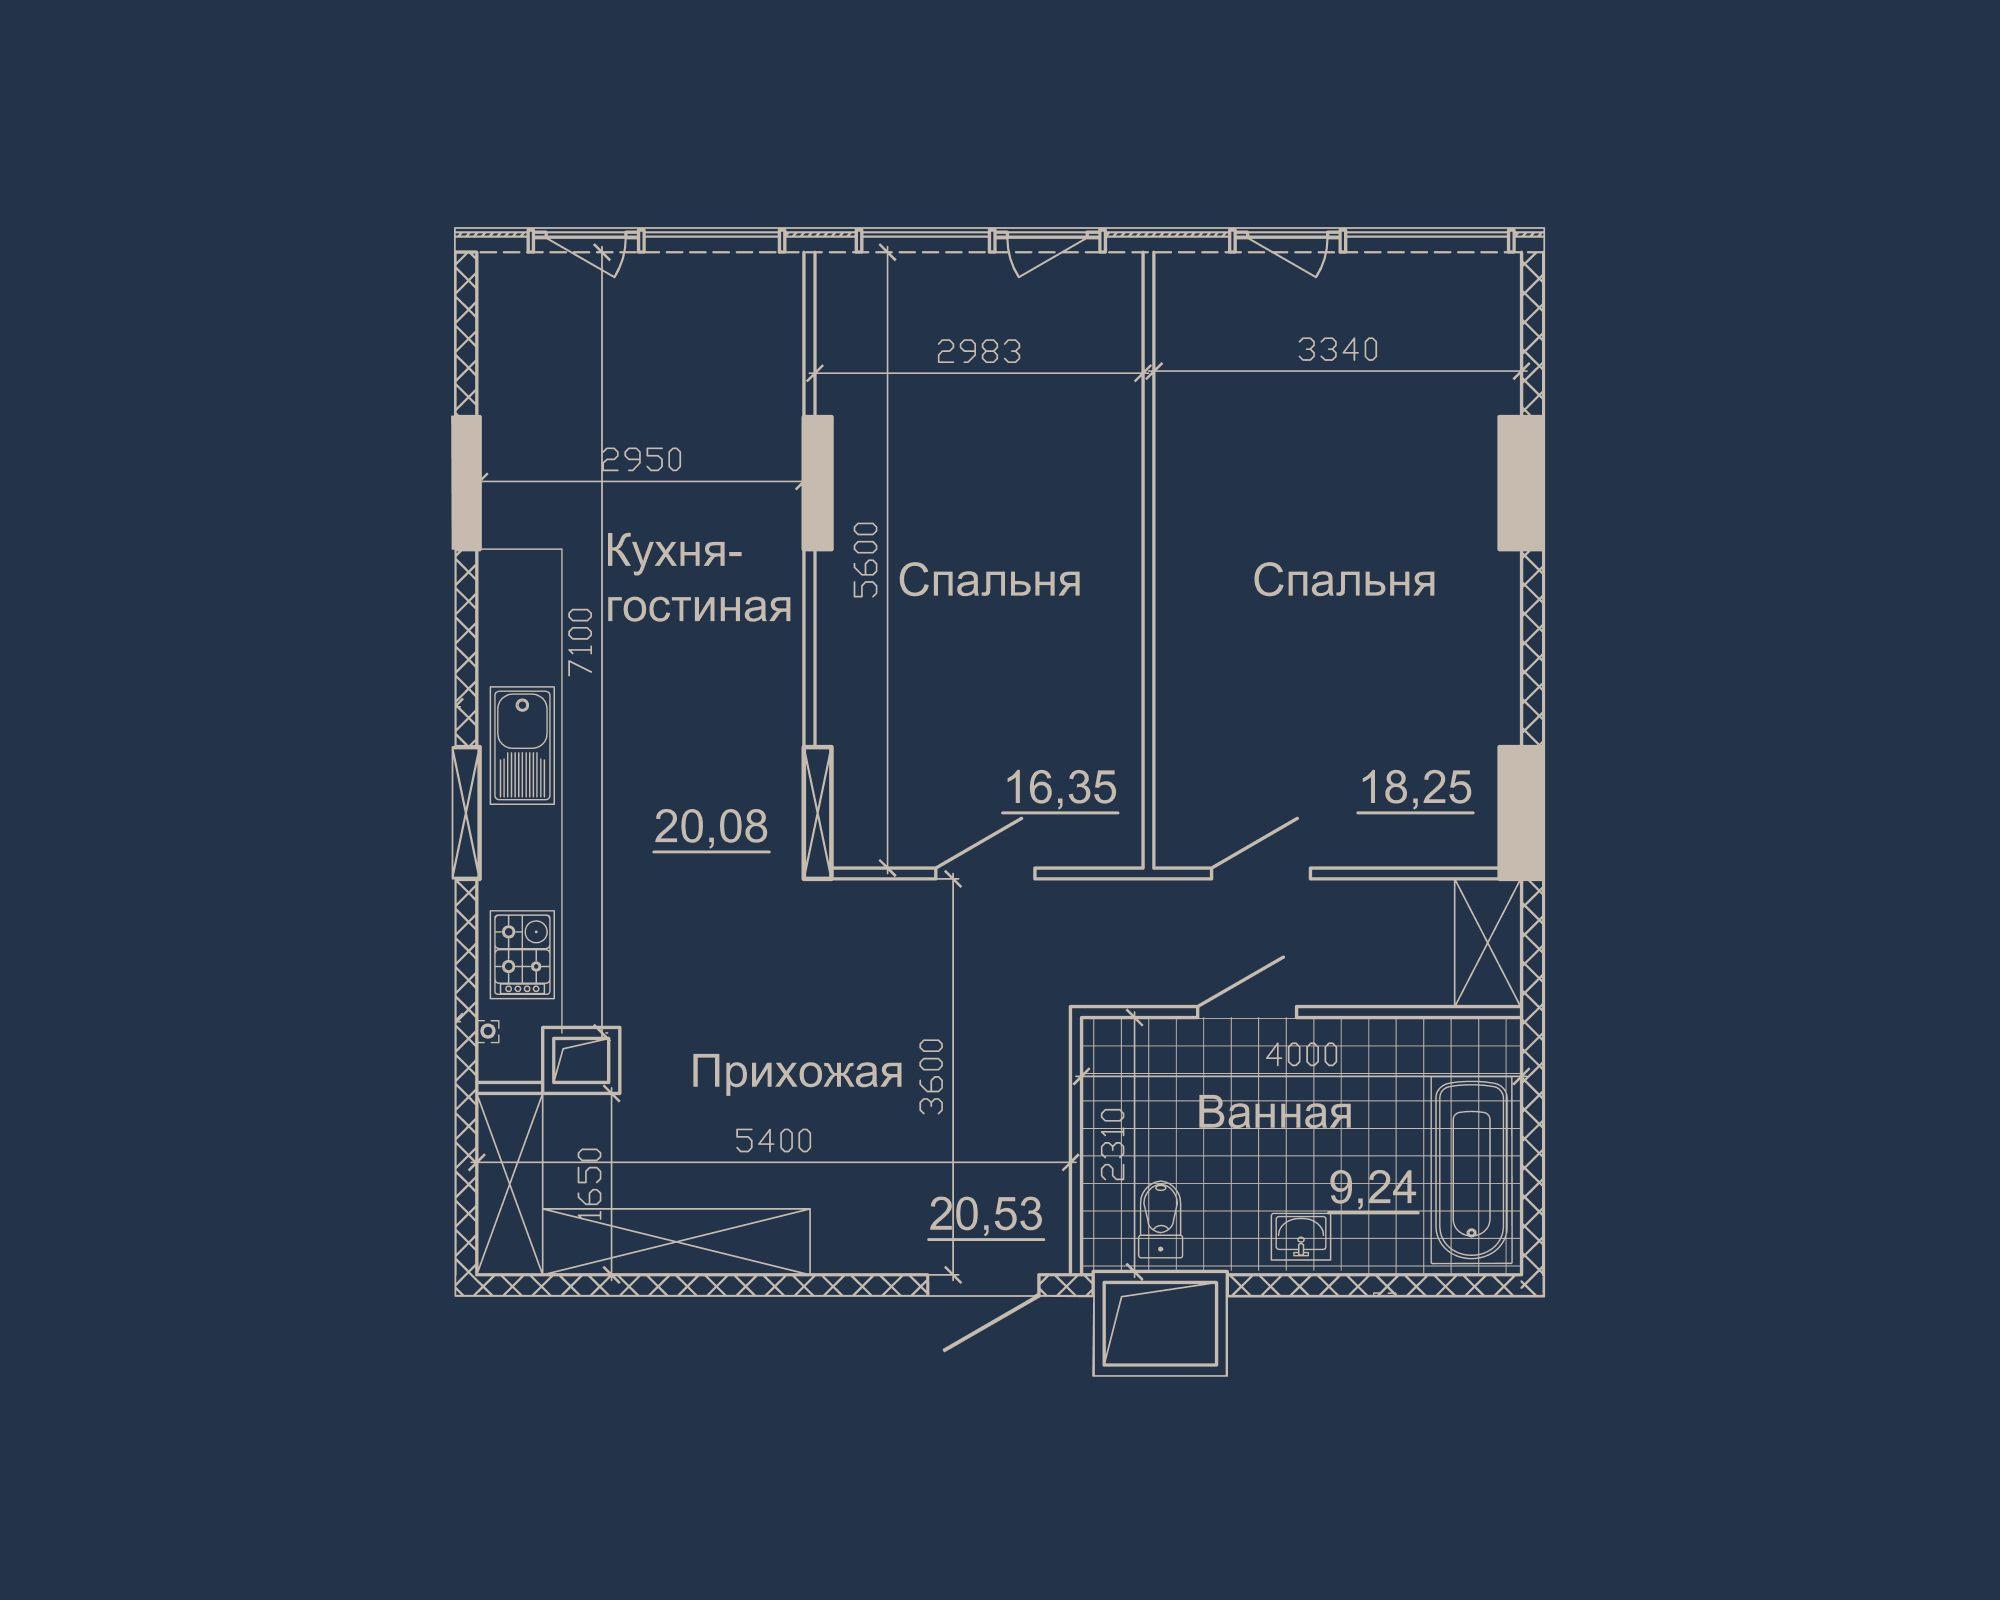 2-кімнатна квартира типу 06А у ЖК Nebo